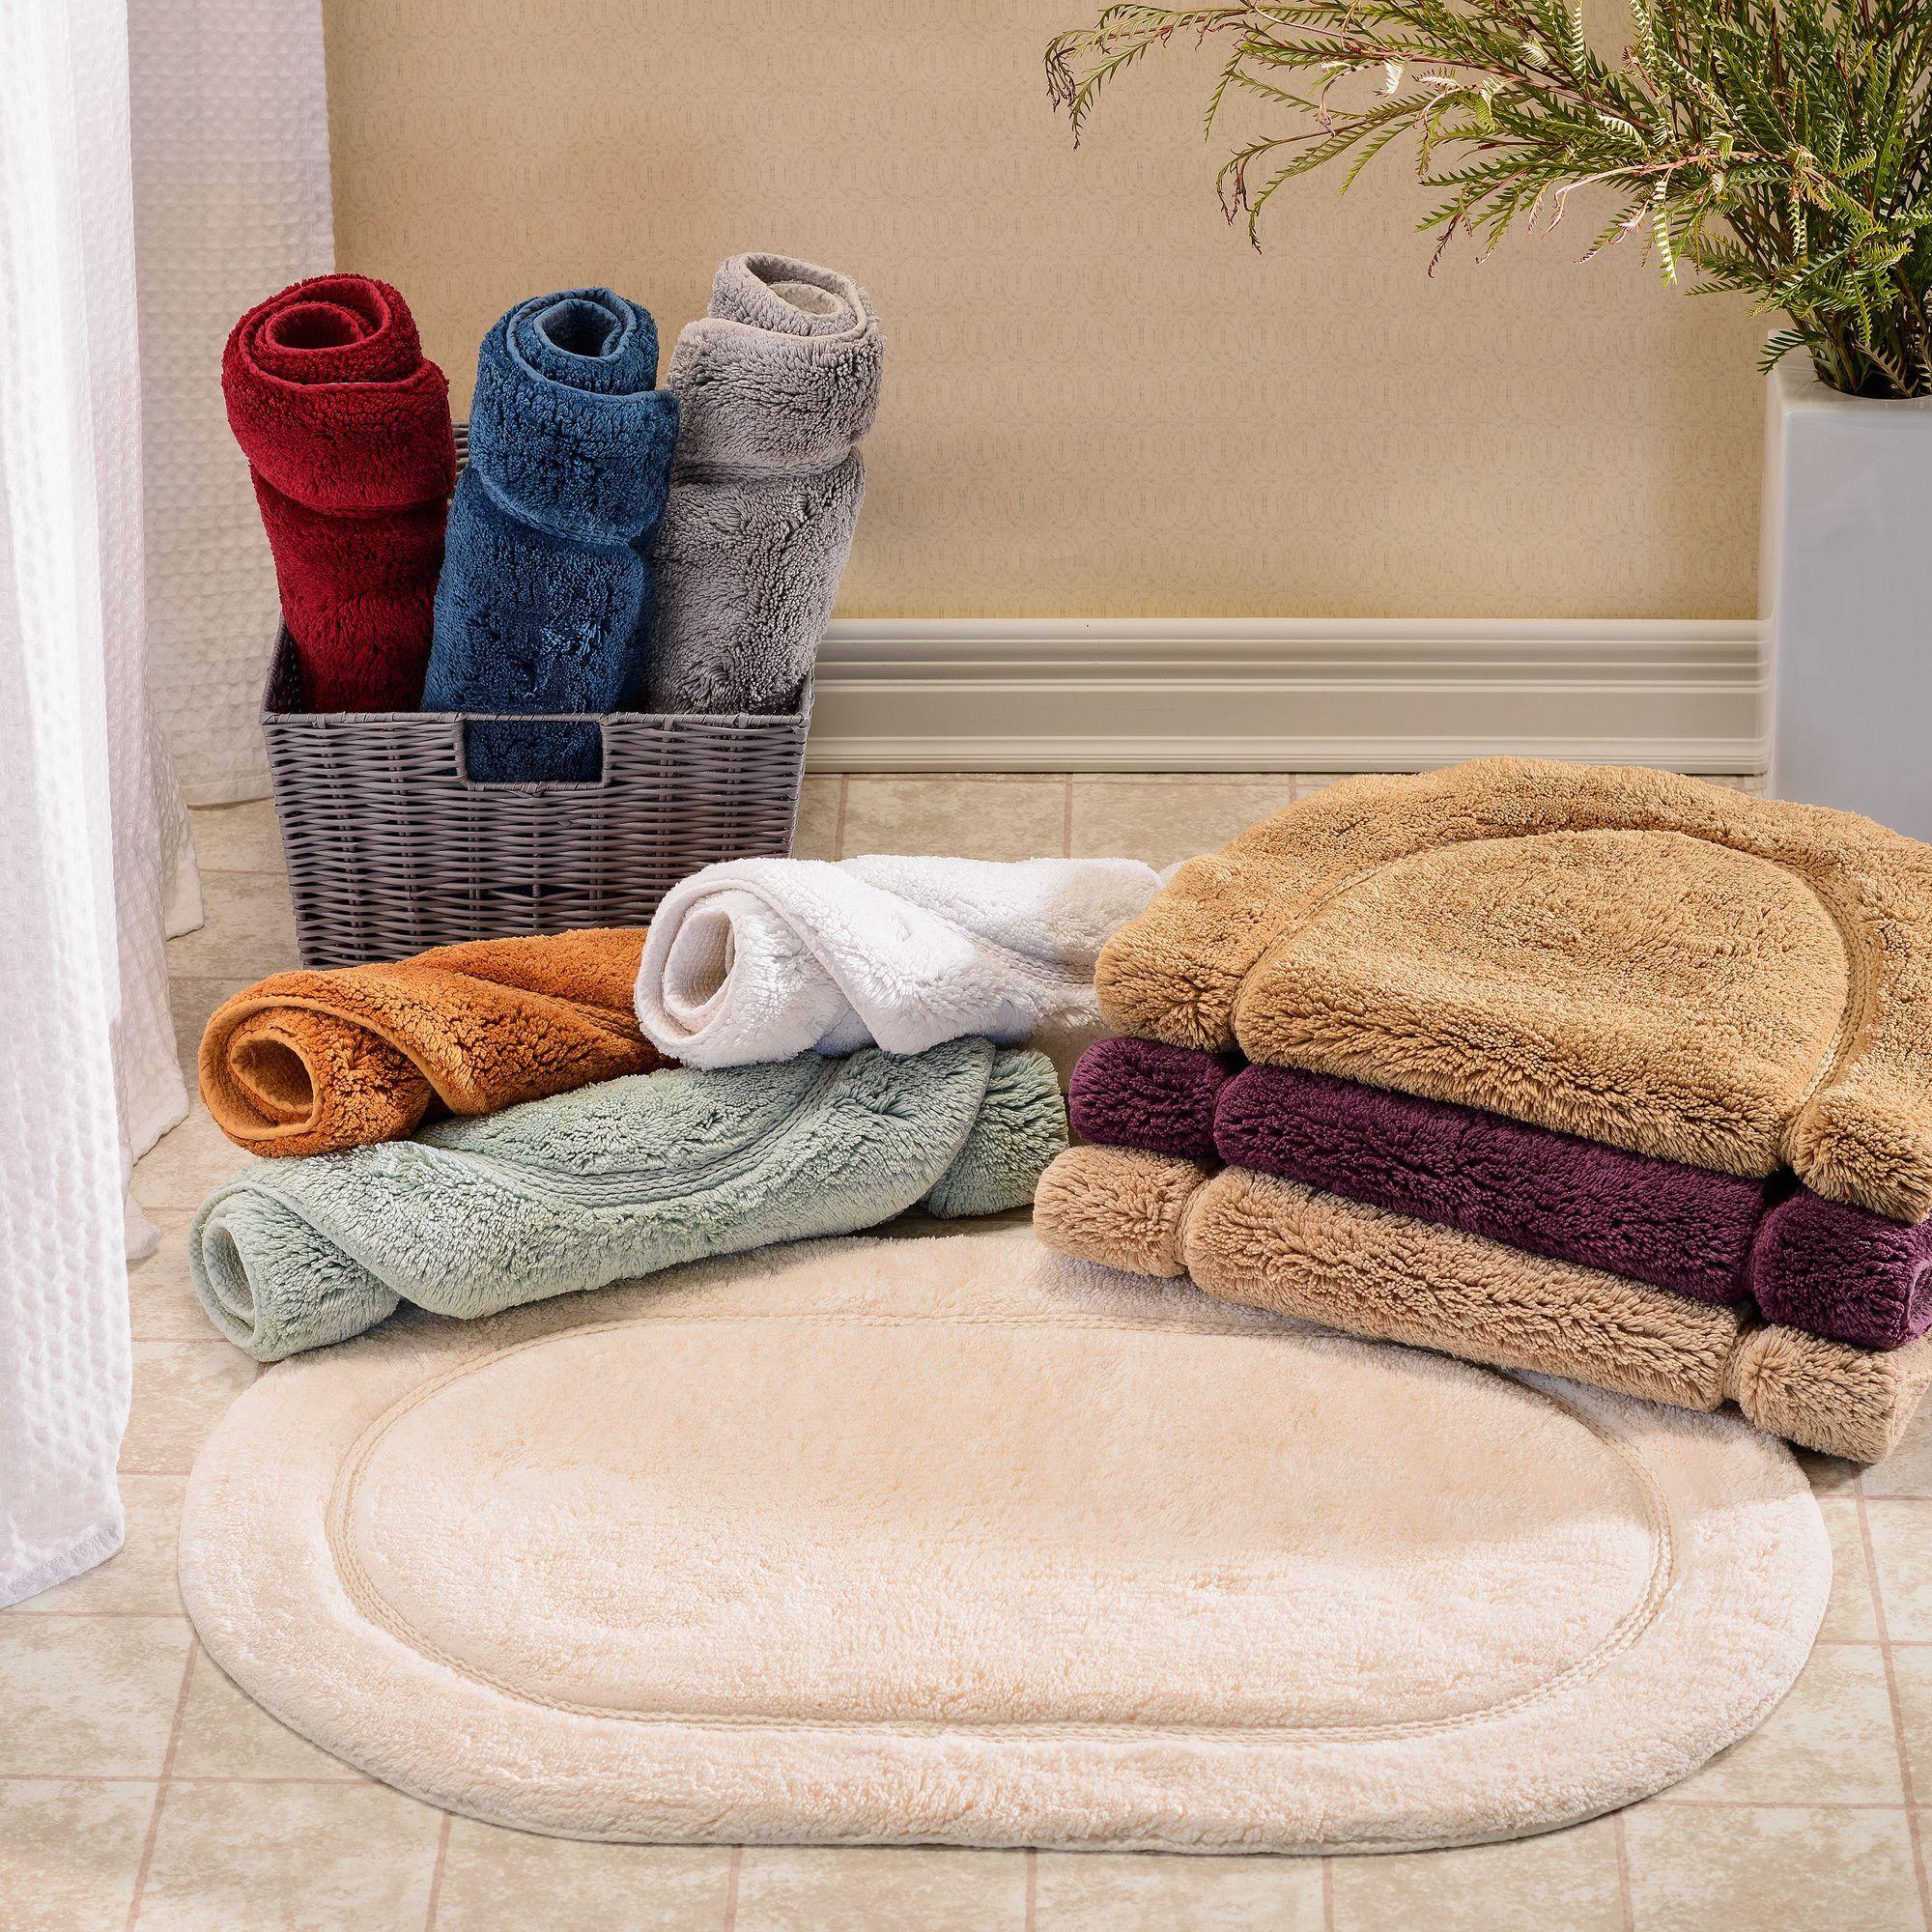 Miranda Haus Collection Luxurious Cotton Non Skid Oval Bath Rug 2